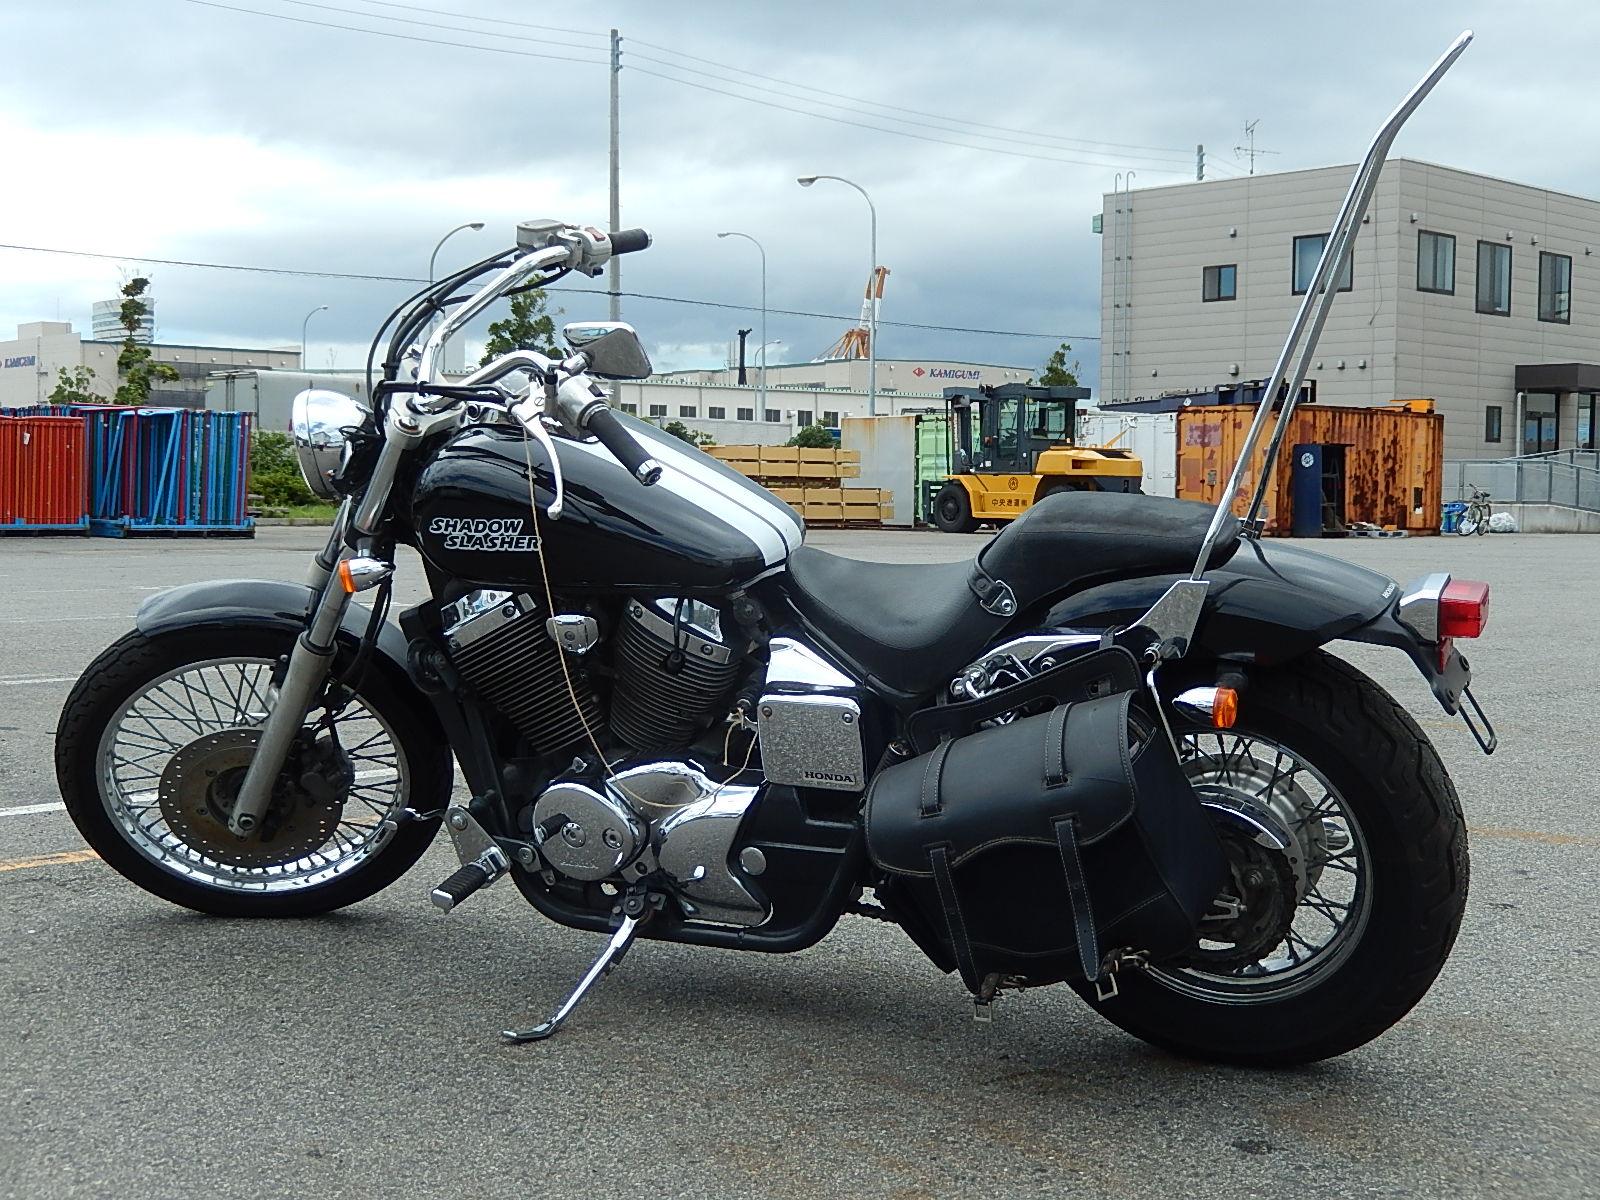 Honda Motorcycles for Sale in Australia - bikesales.com.au